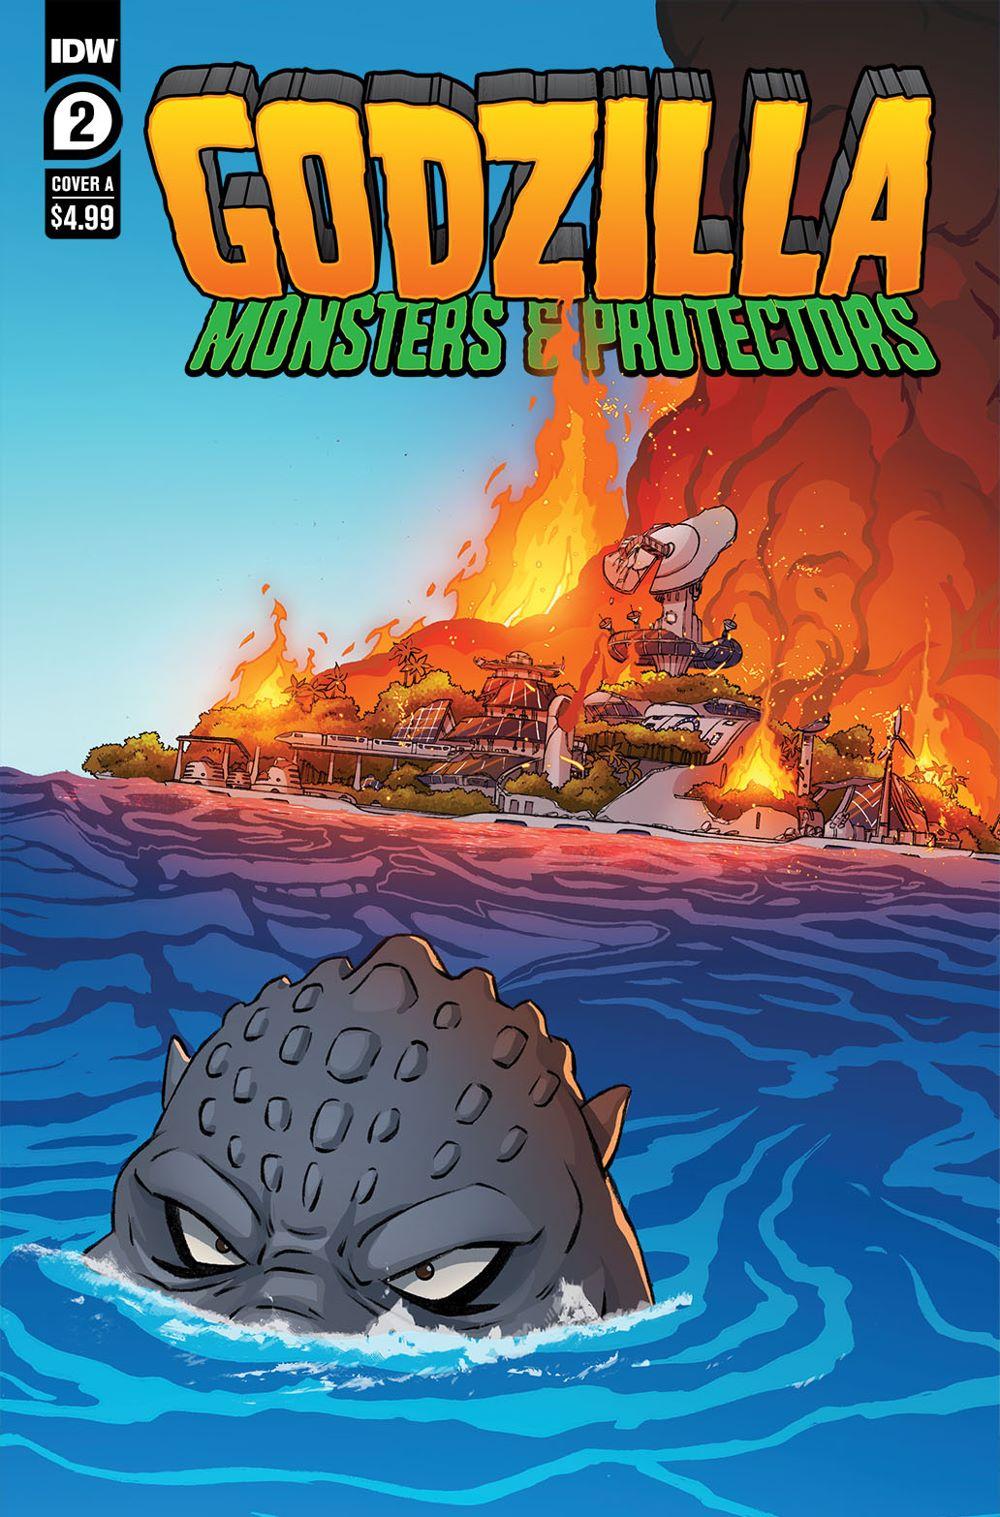 Godzilla_MP02-coverA-copy IDW Publishing May 2021 Solicitations